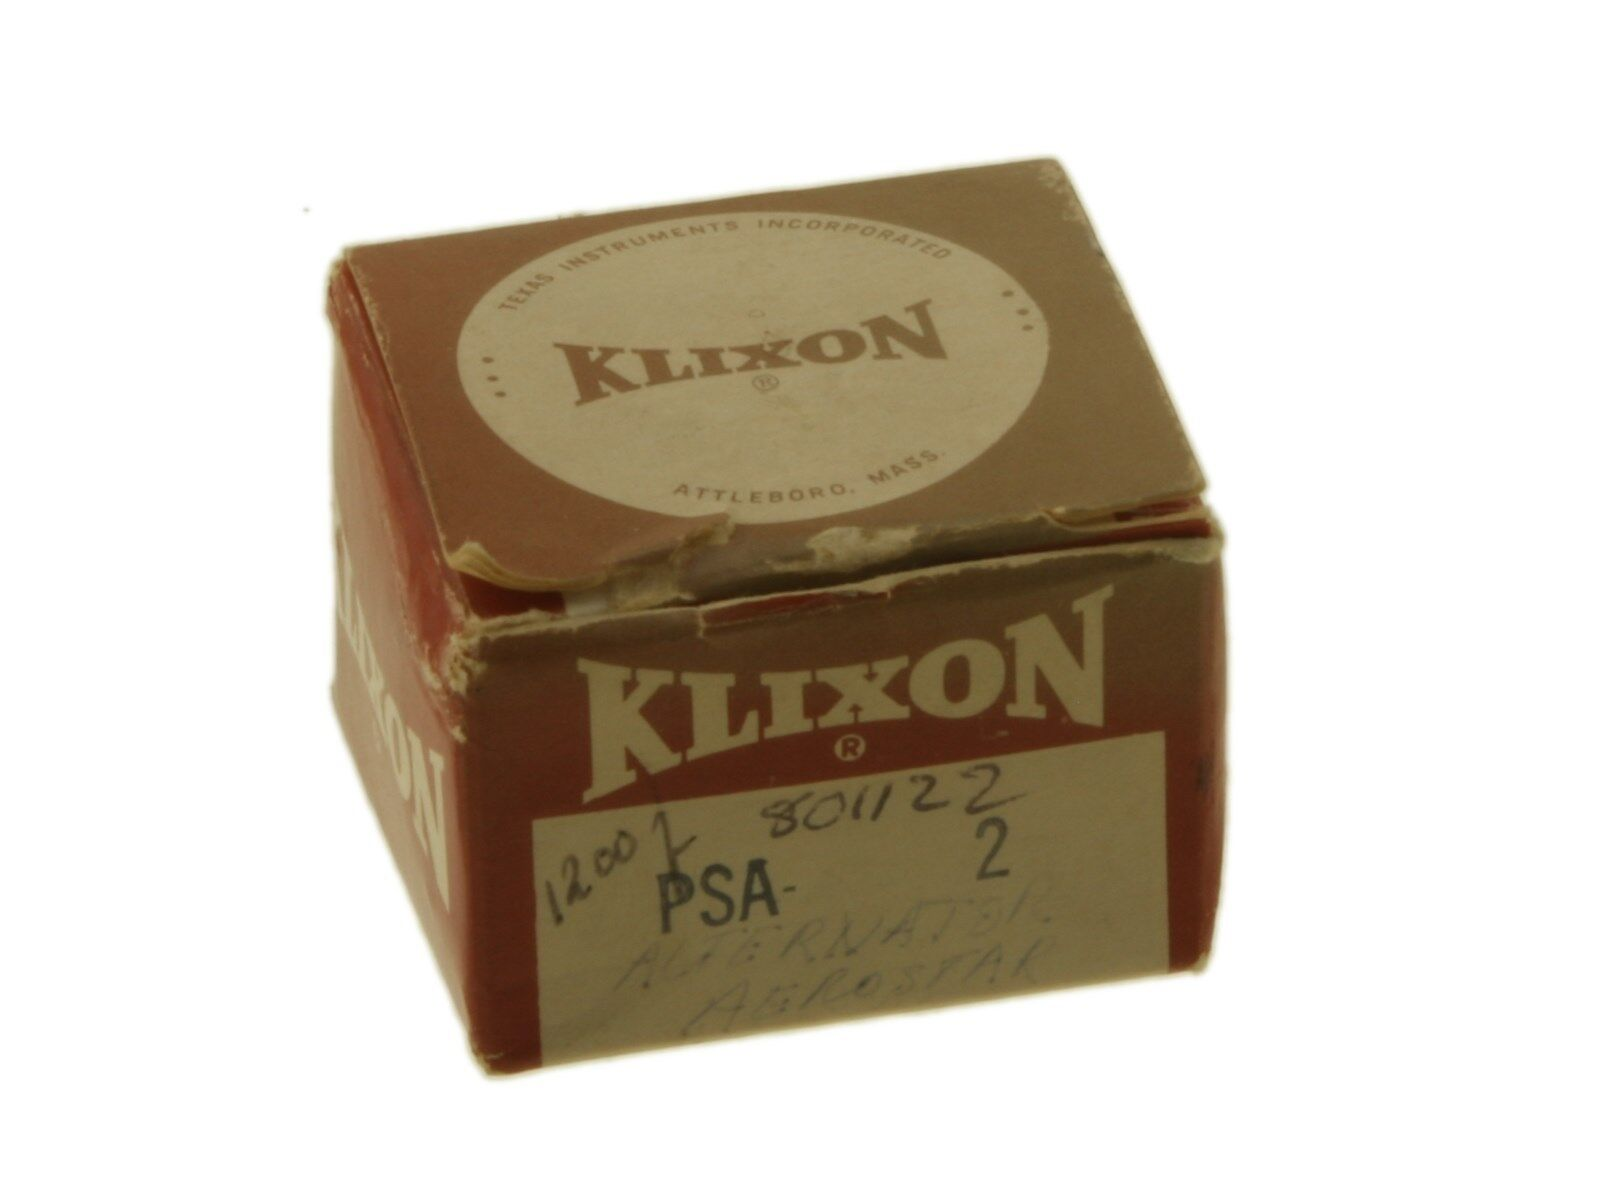 NEW KLIXON PSA-2 CIRCUIT BREAKER